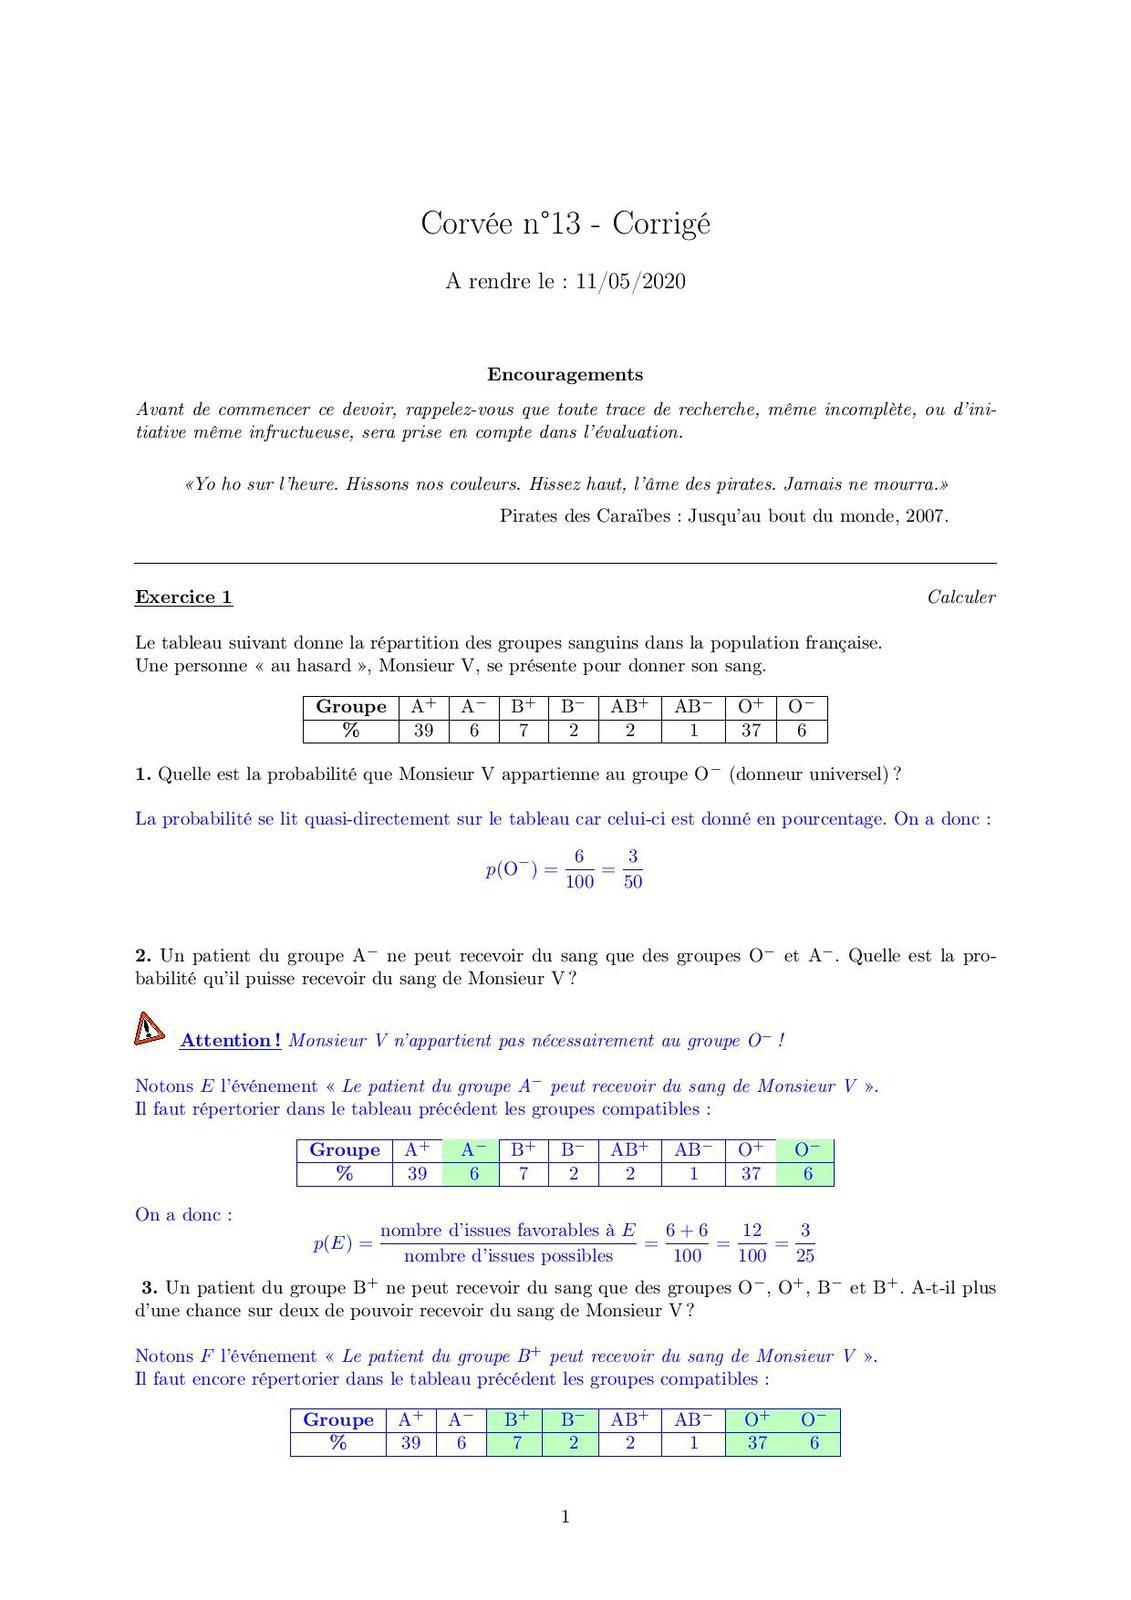 Corvée n°13- Correction Corvée n°13